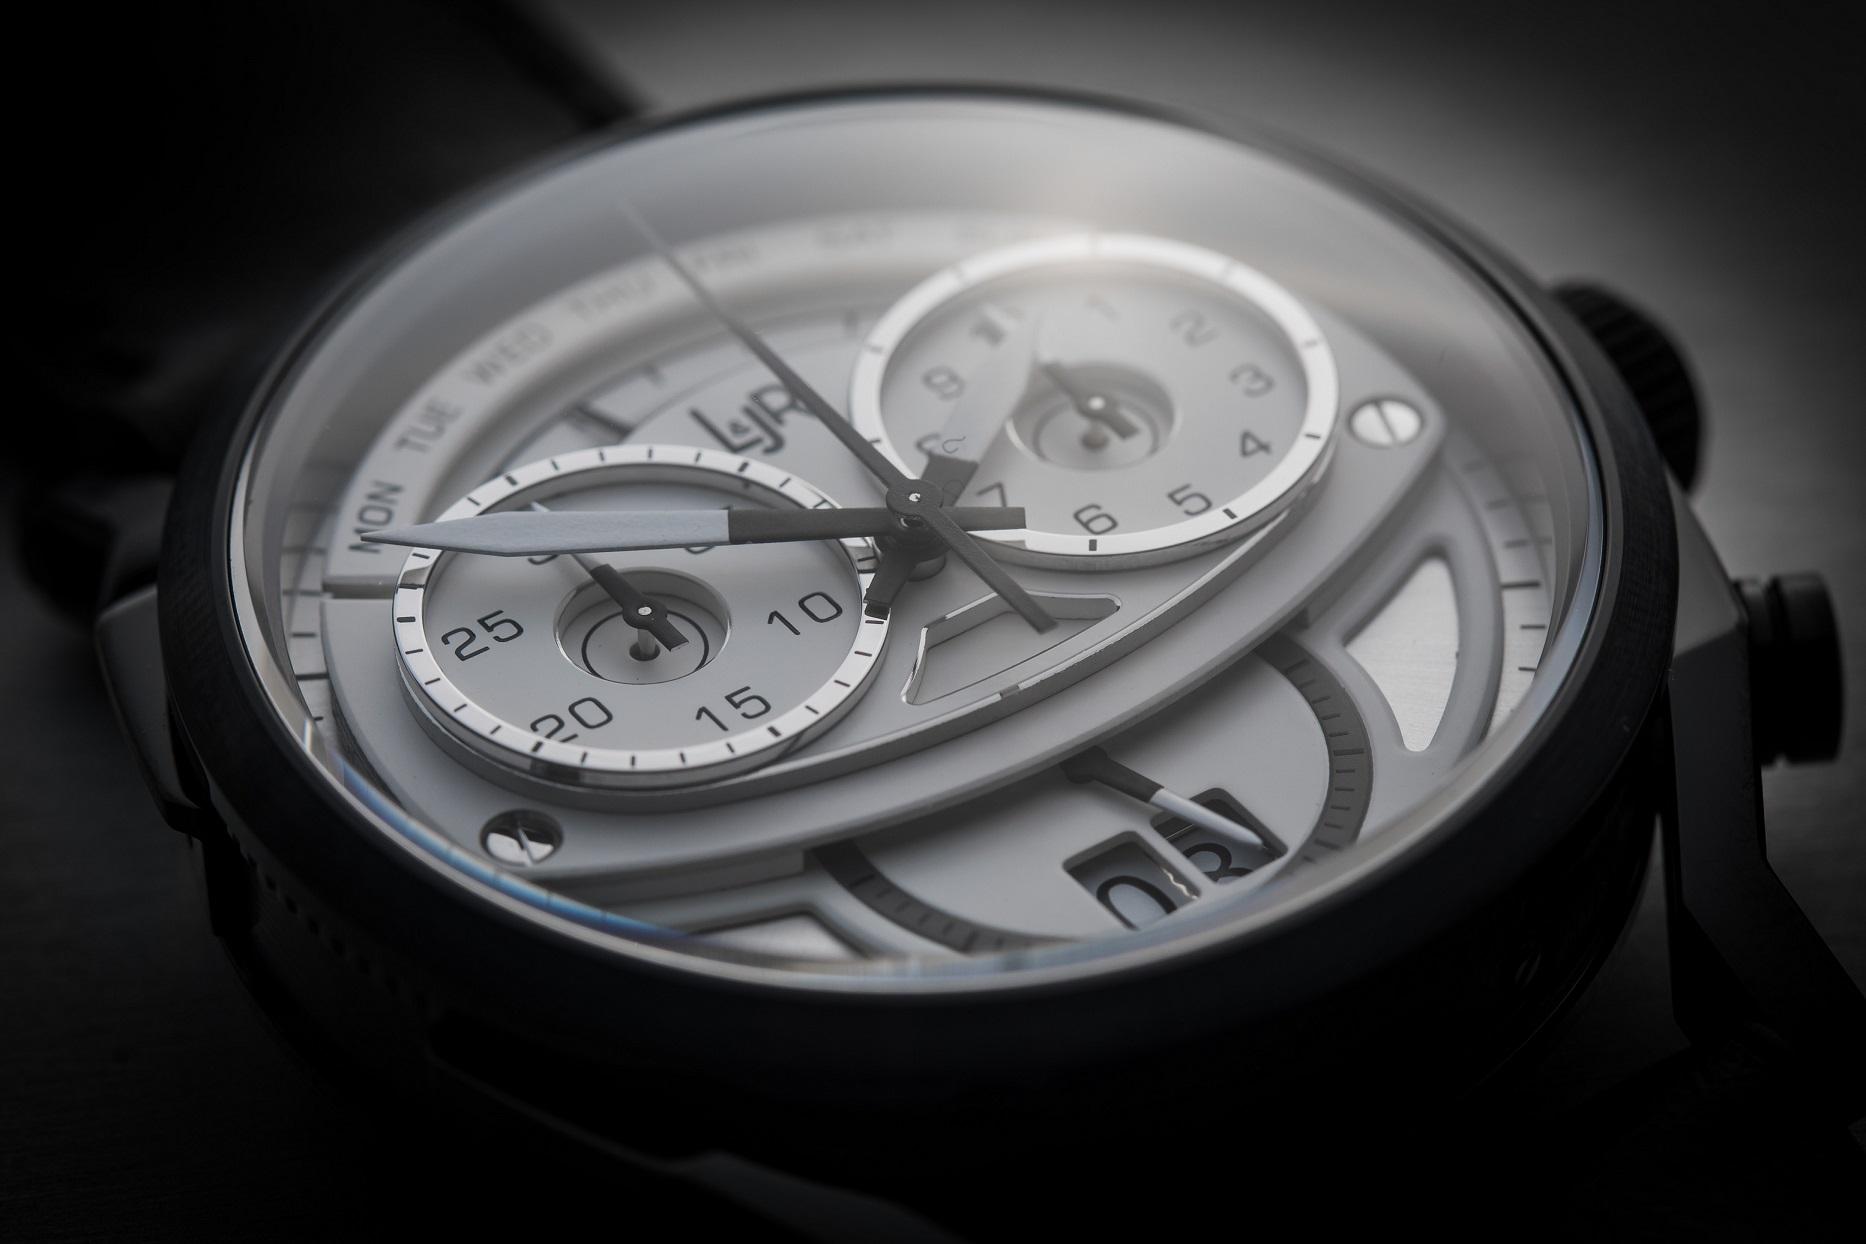 L&JR Step 1 chronograph model